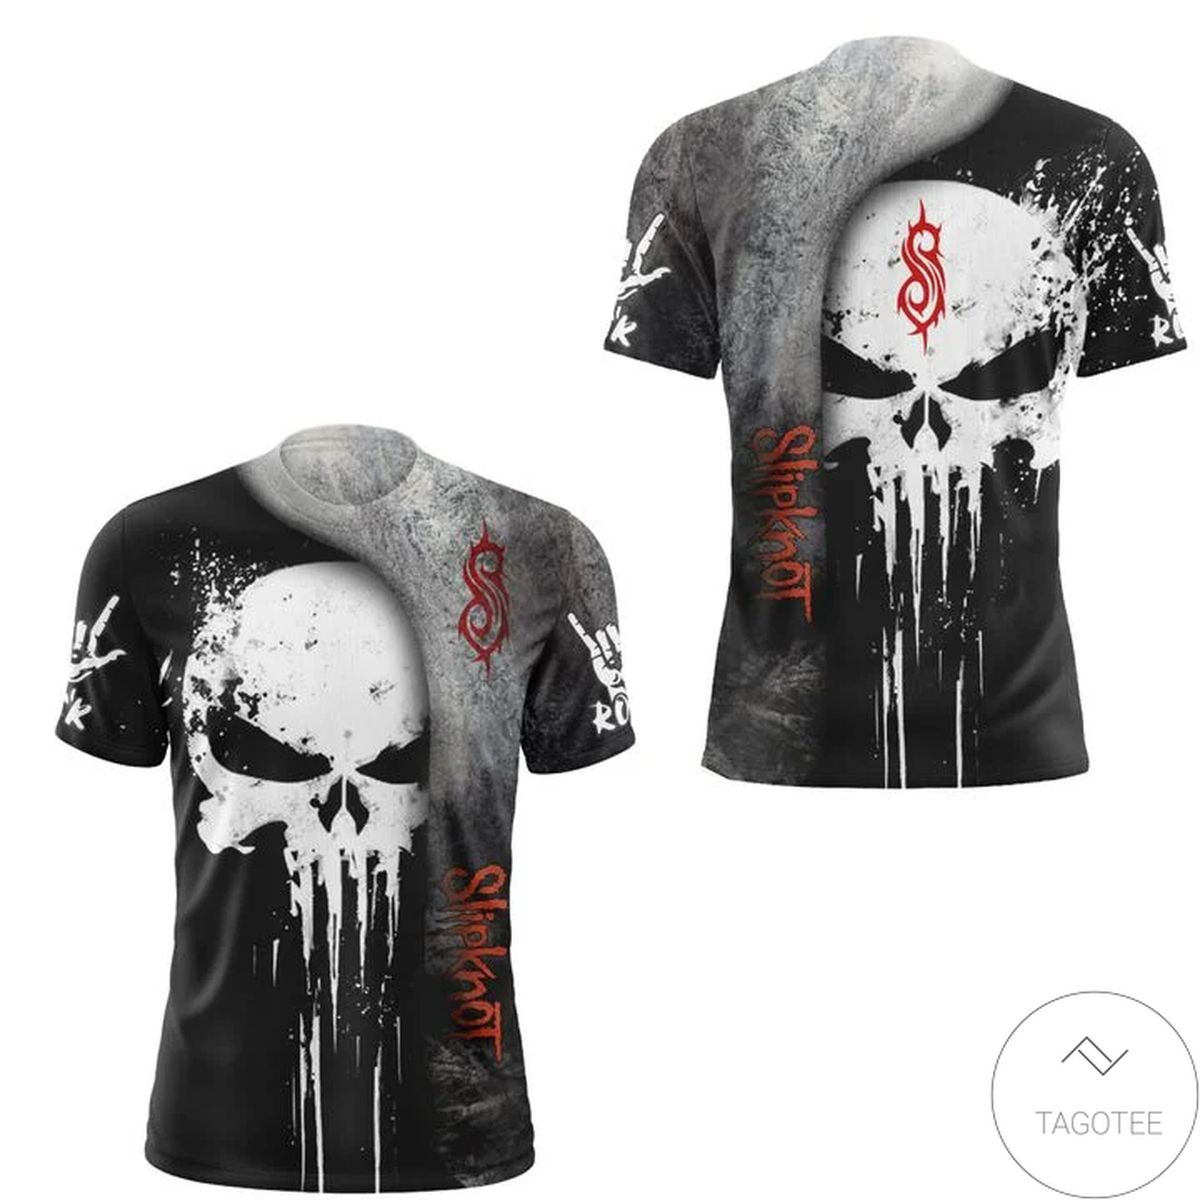 Slipknot Punisher Skull 3D All Over Print T-Shirt and Hoodie